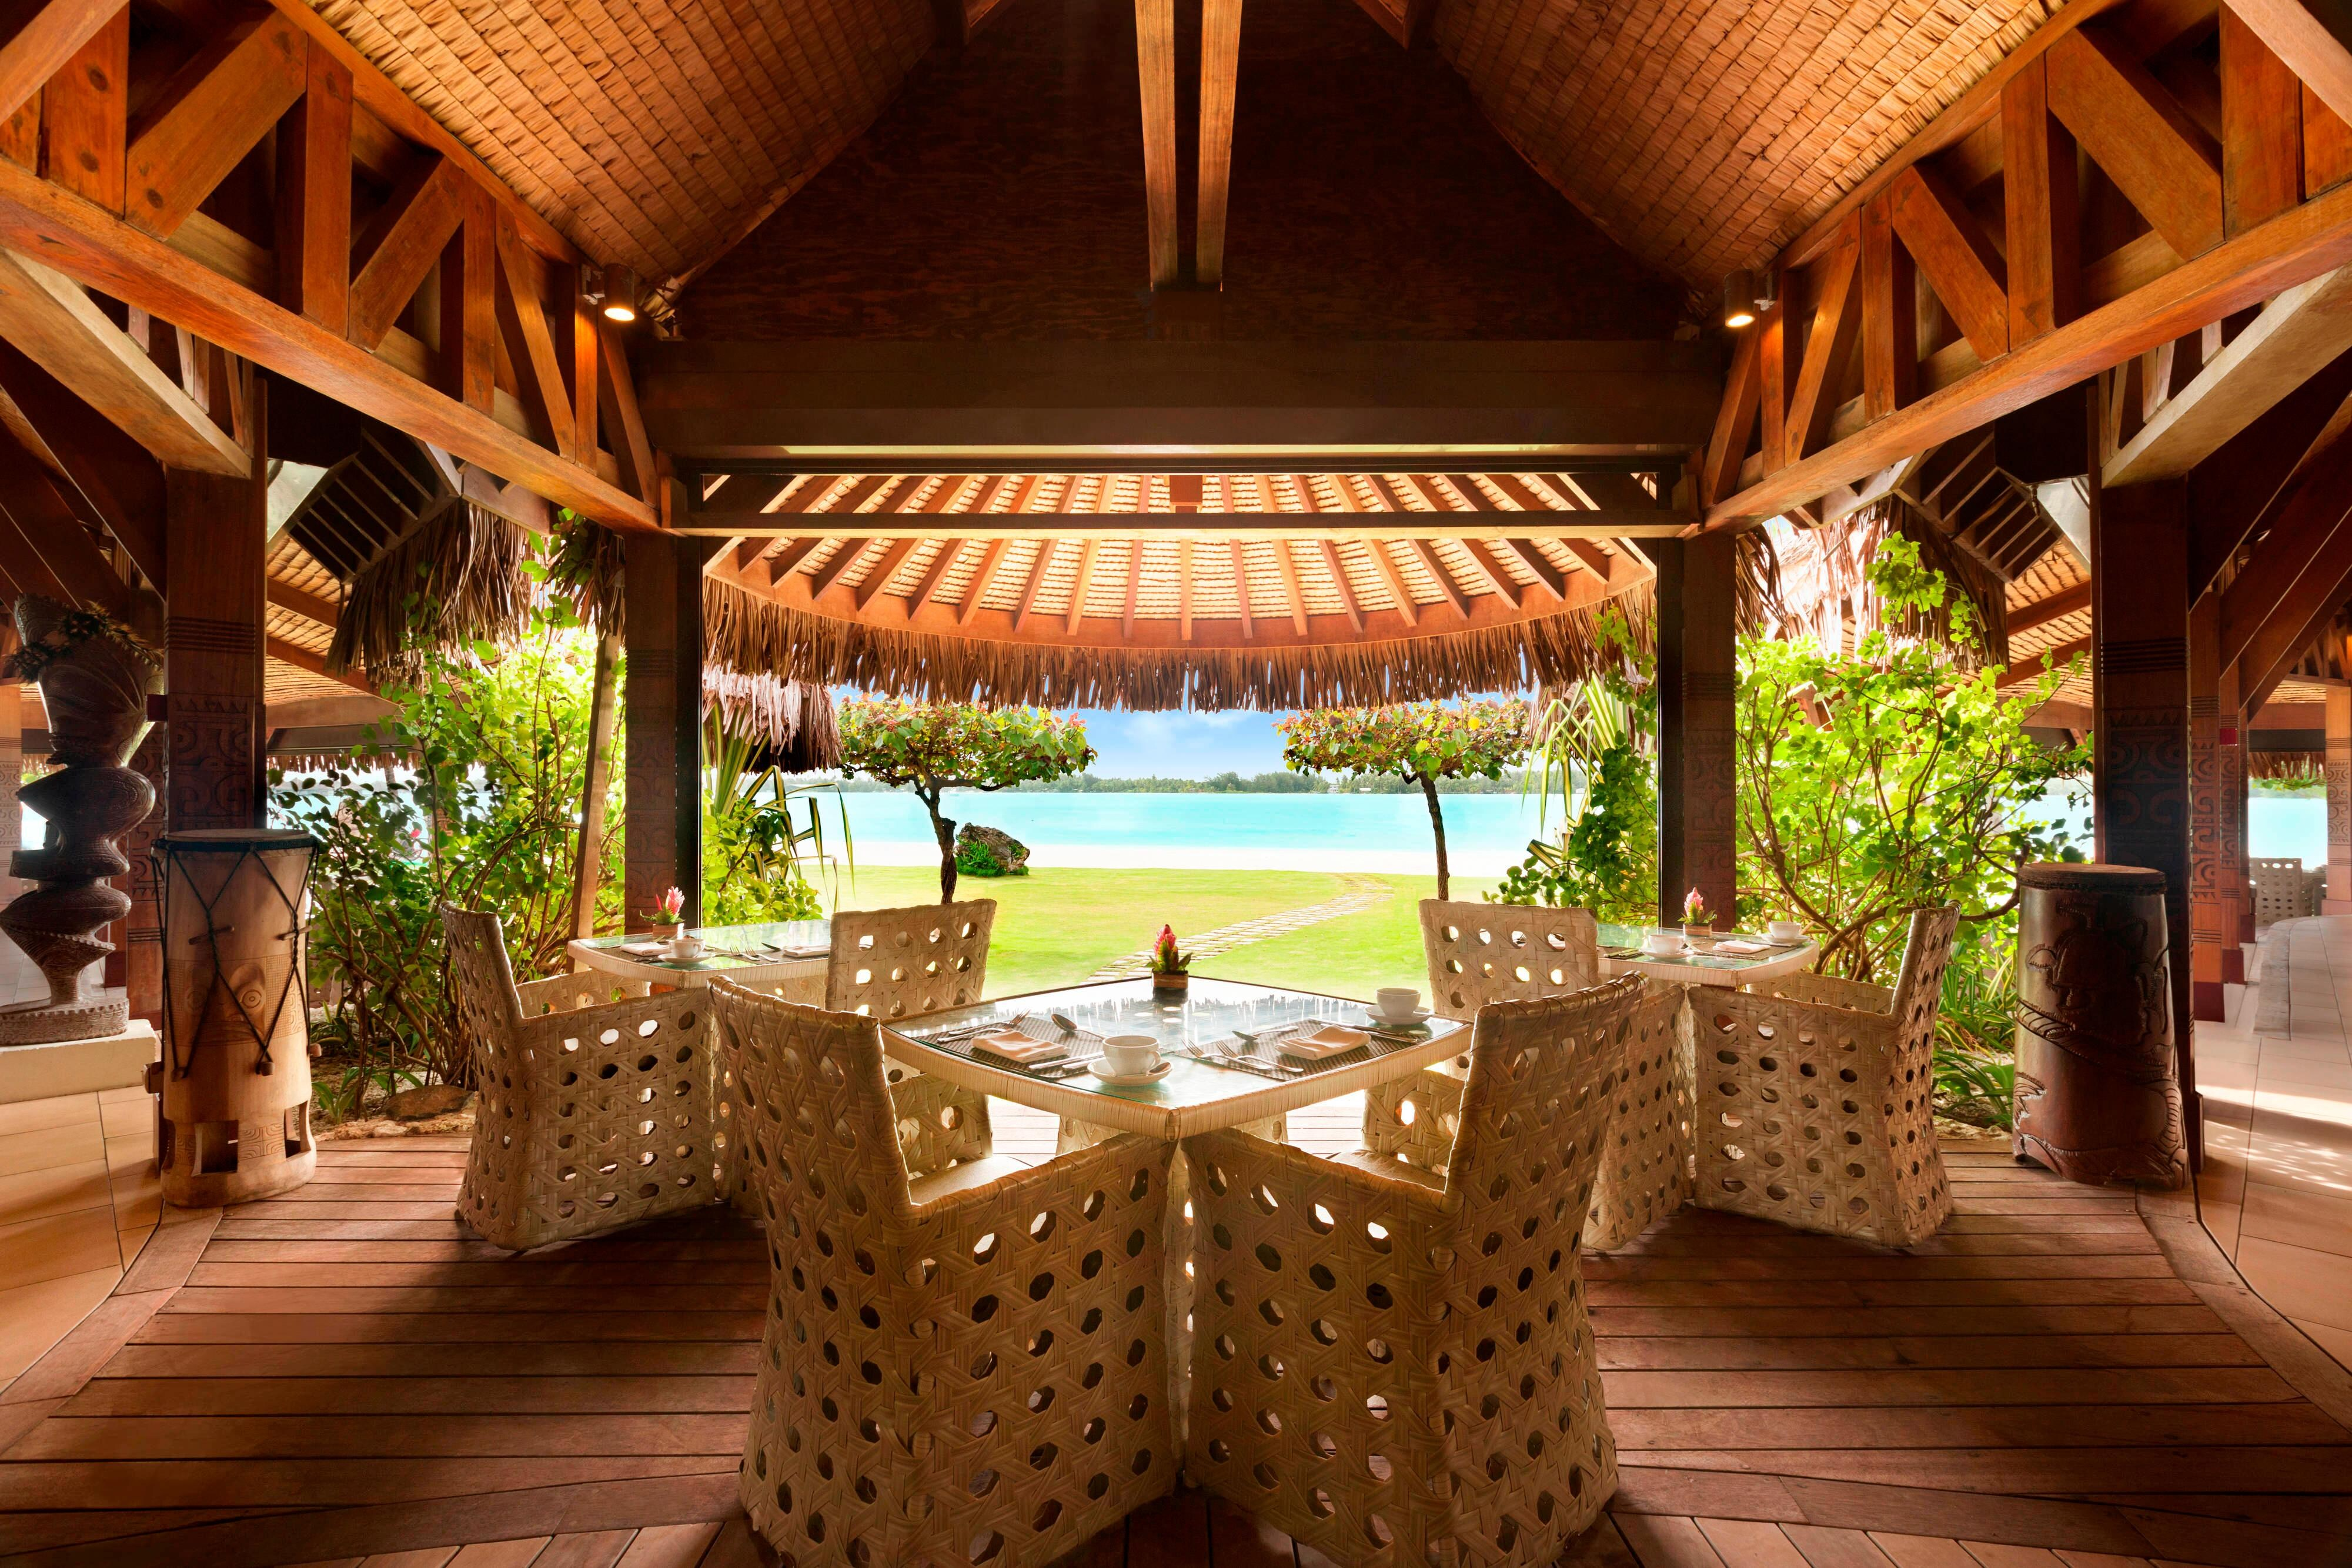 Te Pahu Restaurant